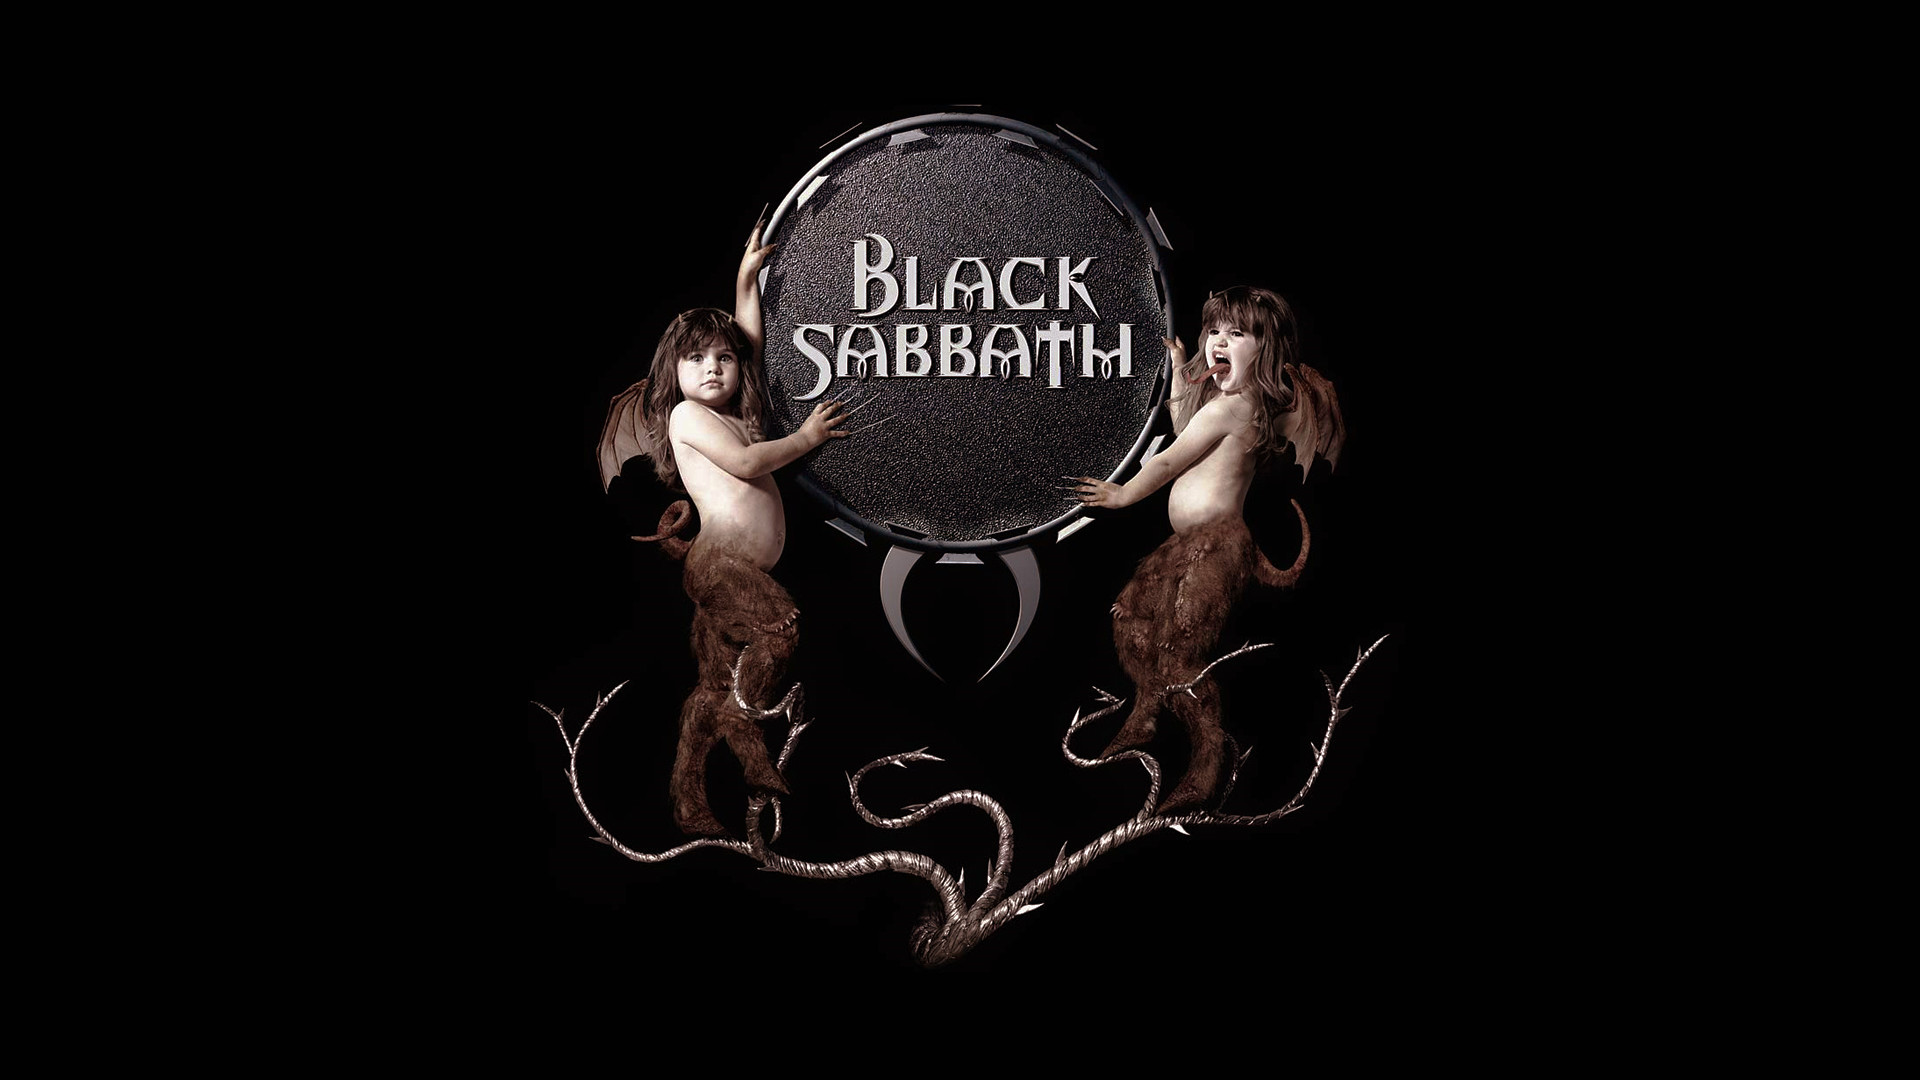 Black Sabbath by ORANGEMAN80 Black Sabbath by ORANGEMAN80